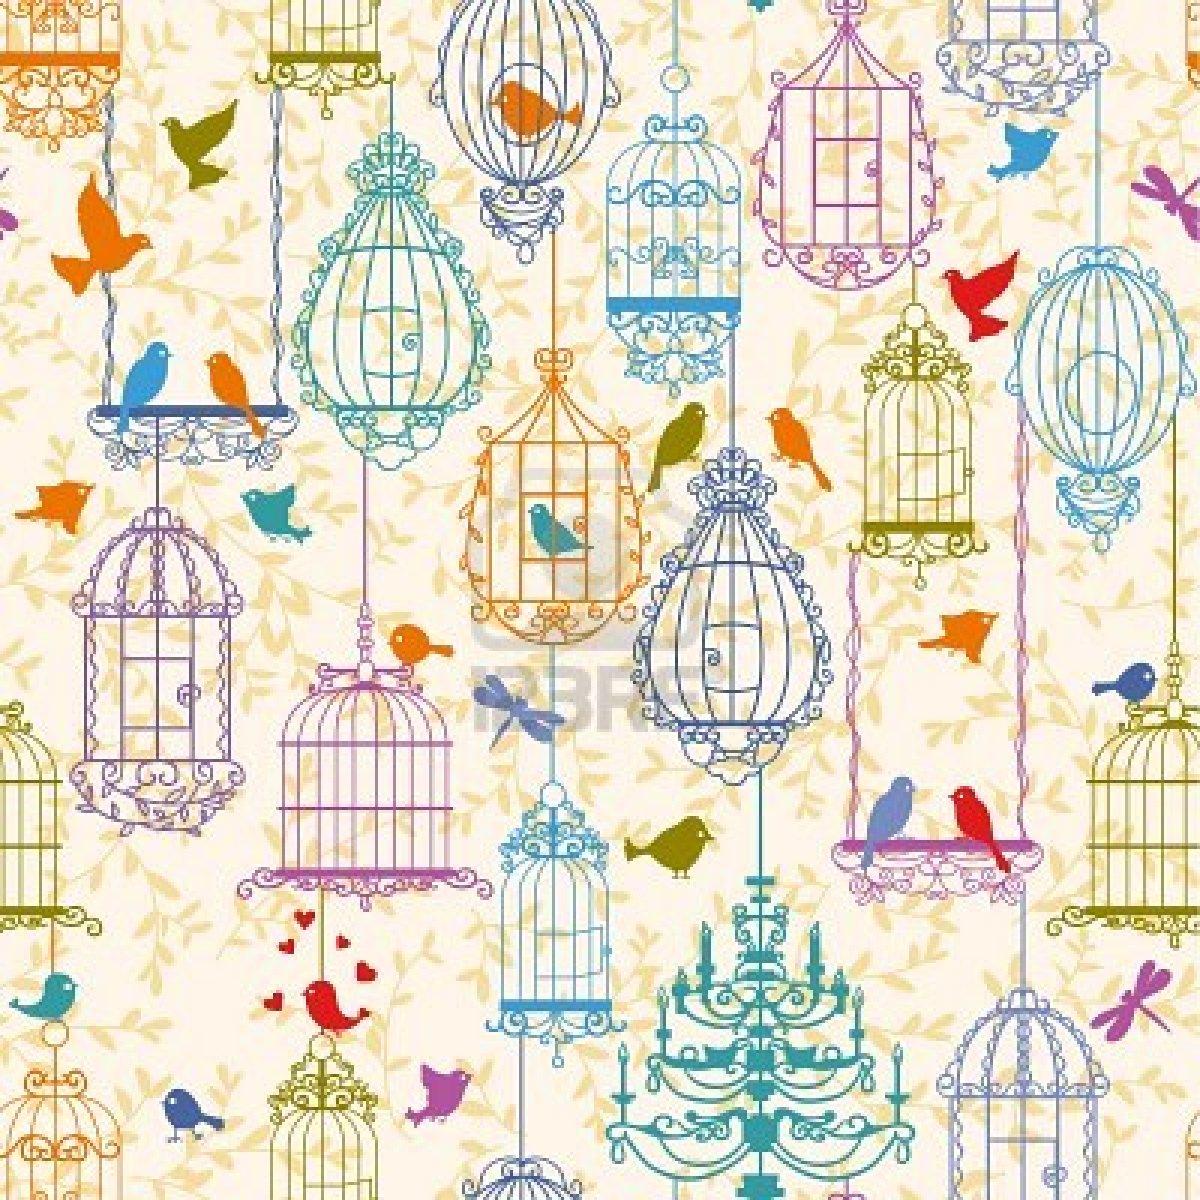 Vintage Birdcage Wallpaper 1200x1200